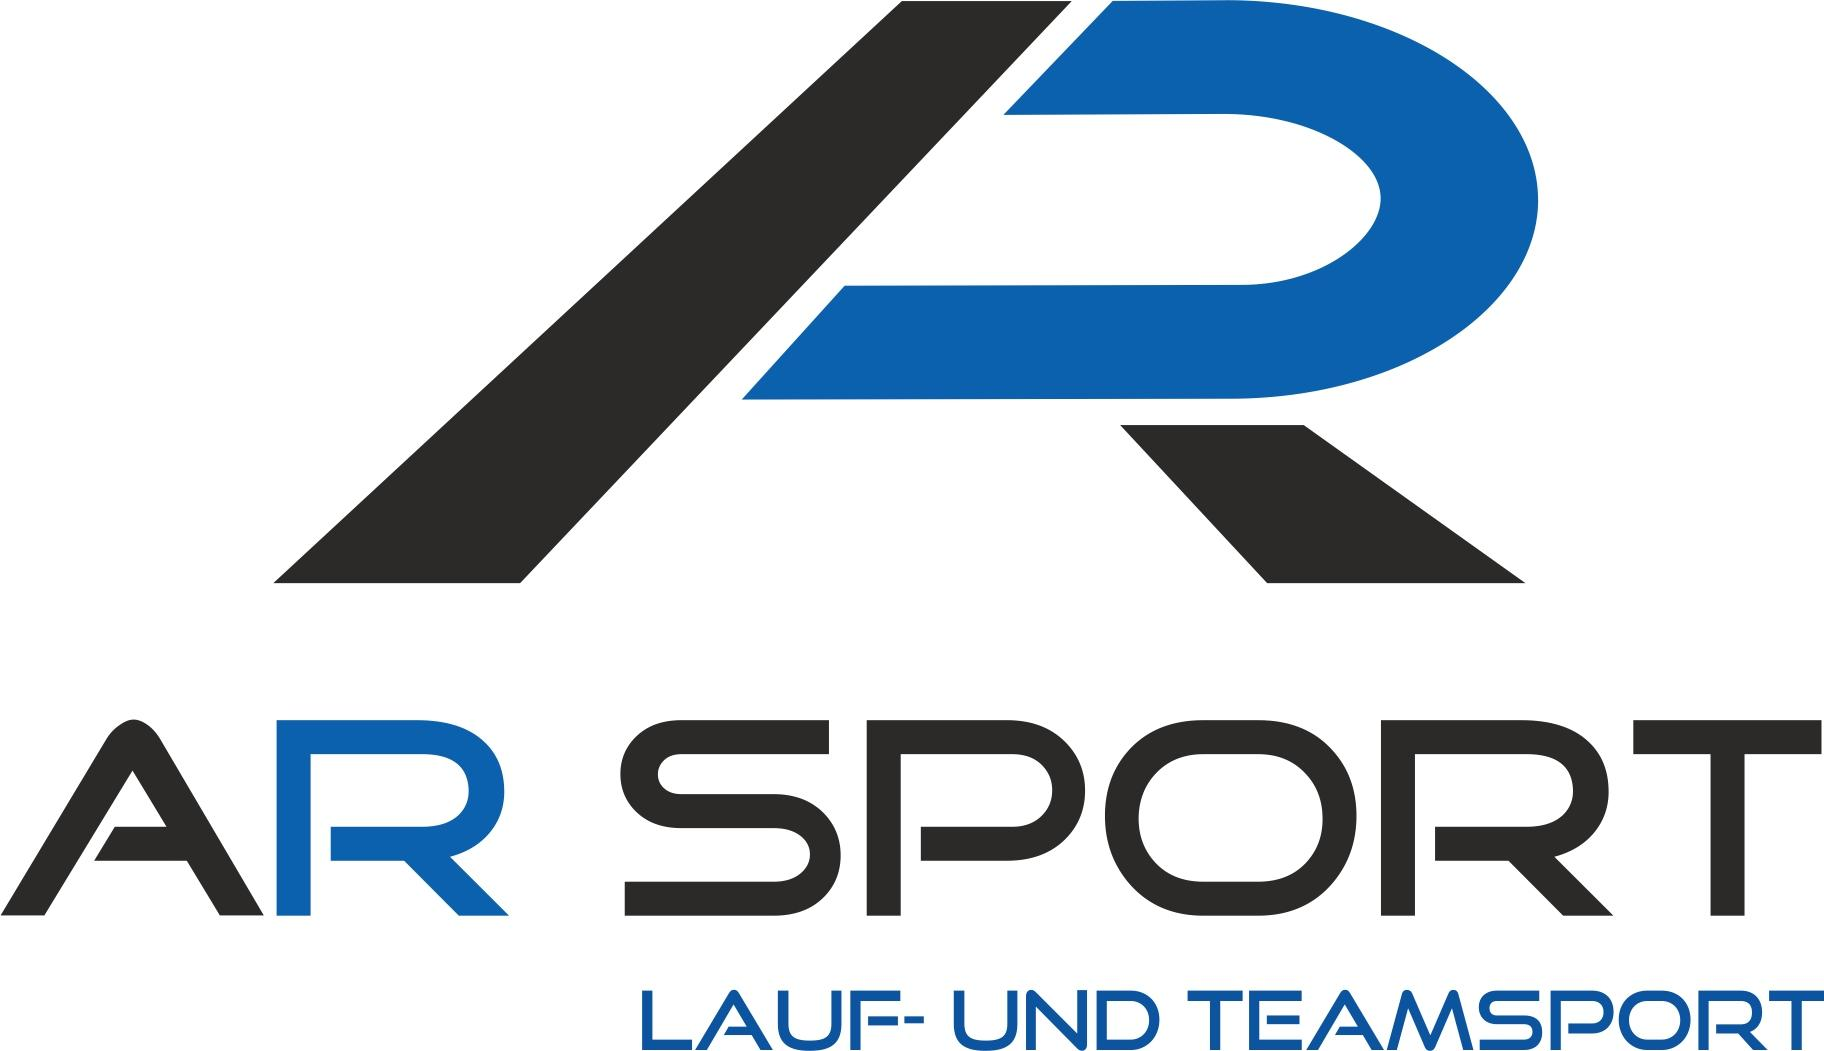 AR-Sport